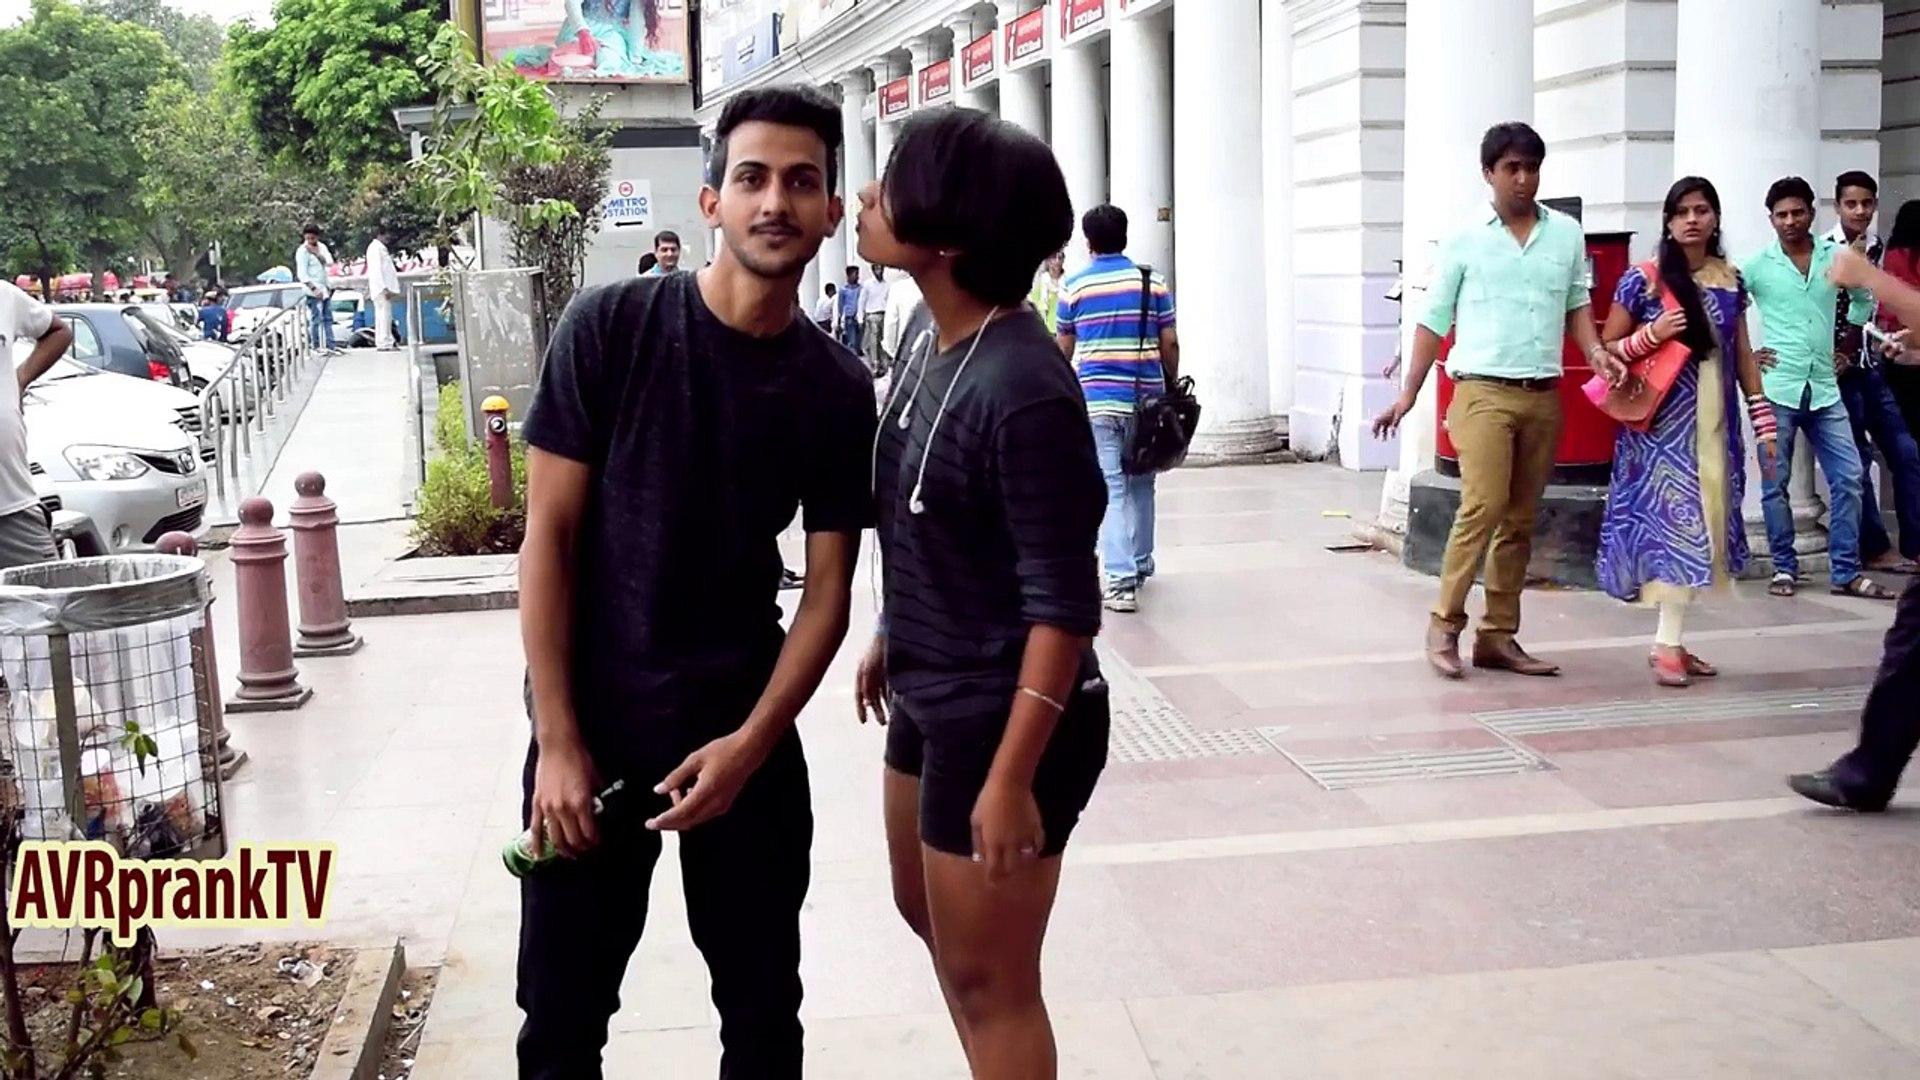 Kissing Prank India - Spin The Bottle   AVRprankTV